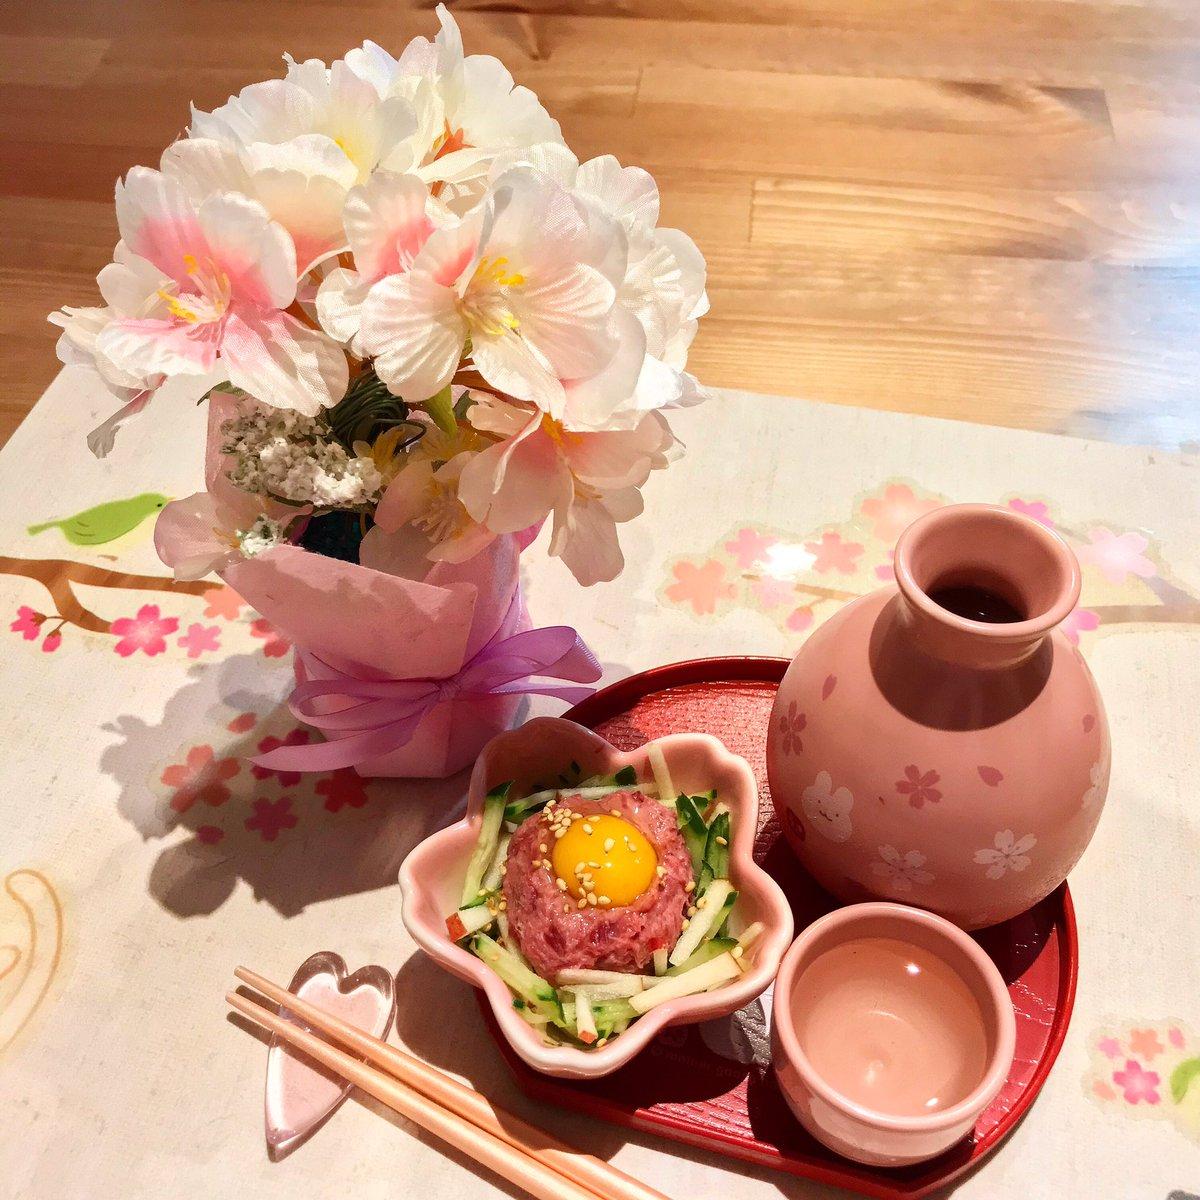 test ツイッターメディア - コンビーフユッケでエア花見🌸2019  ダイソーグッズとハードオフで見つけた雑貨や酒器セットというプチプラコーデですが、結構気分はアガります⤴️   コンビーフじゃなくて馬肉(桜肉)だったらパーフェクト💯だったなあ。  #日本酒 #エア花見 #ダイソー #リサイクルショップ https://t.co/BmdOfxenDi